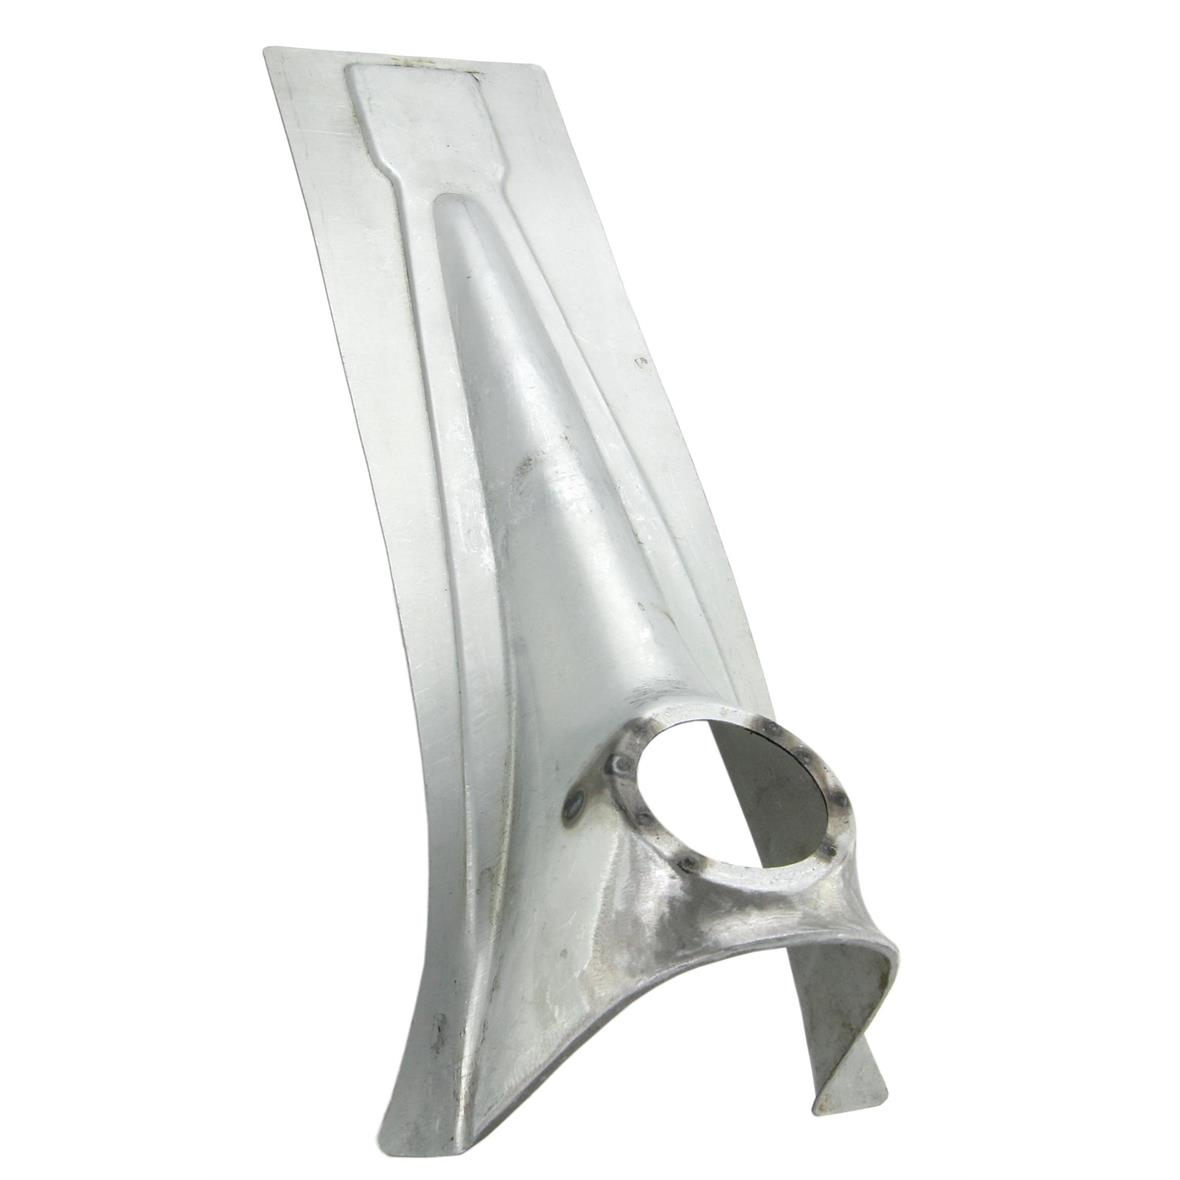 Vespa VNA VNB VBA GS150 VBB Pressed Aluminium Fork Link Cover